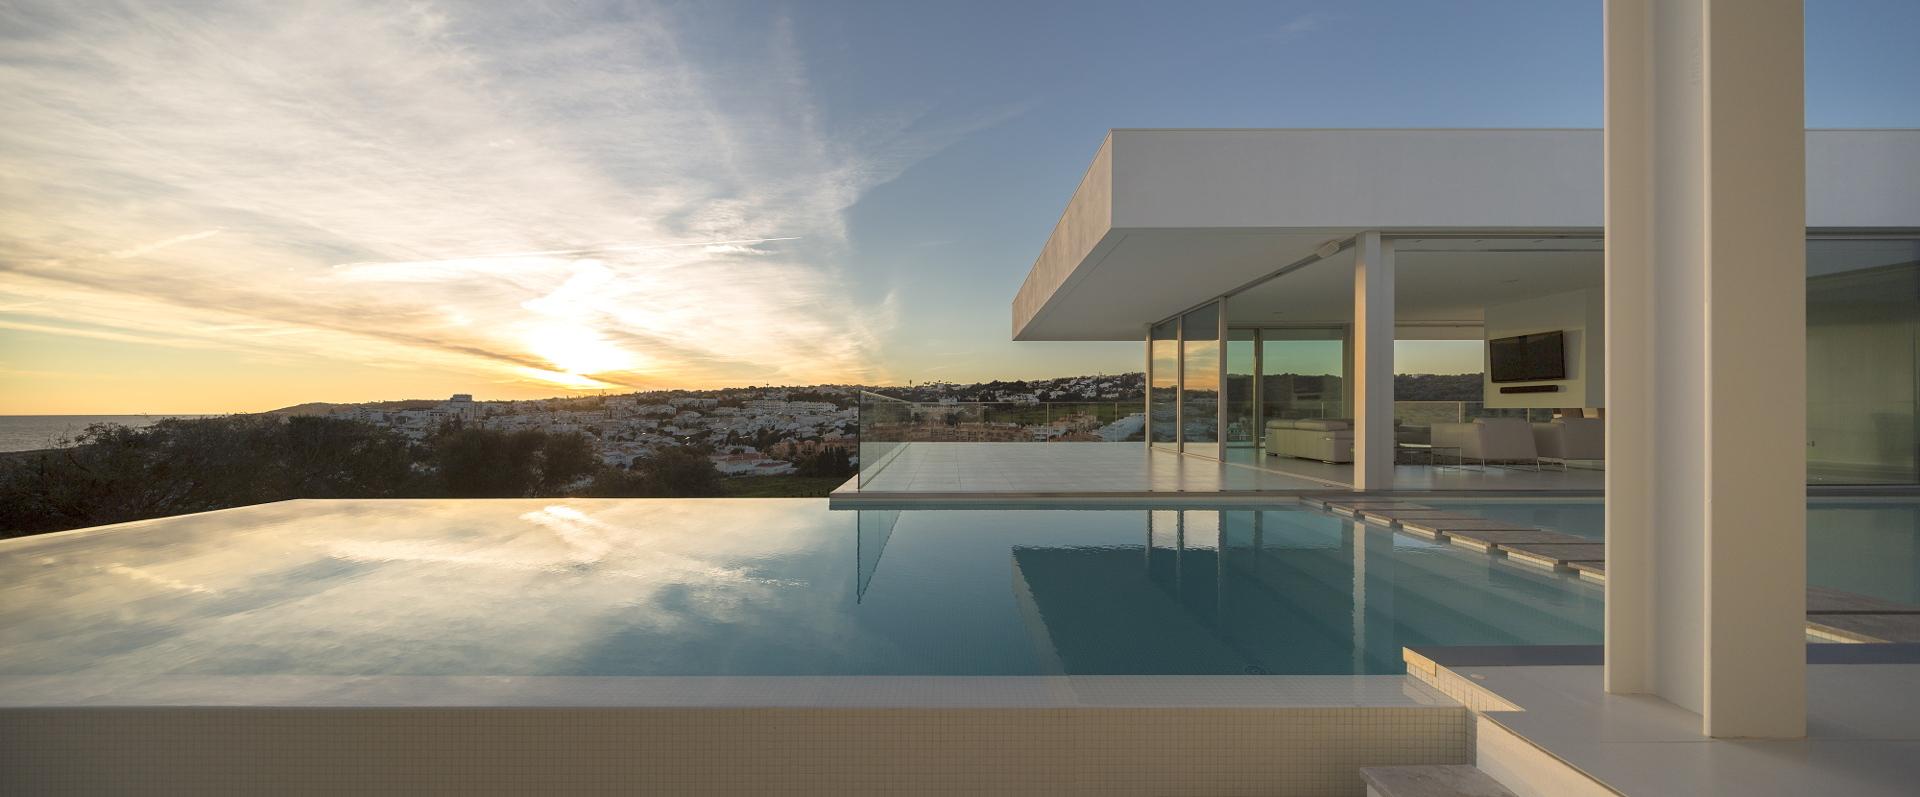 Interview with Portuguese architect Mario Martins